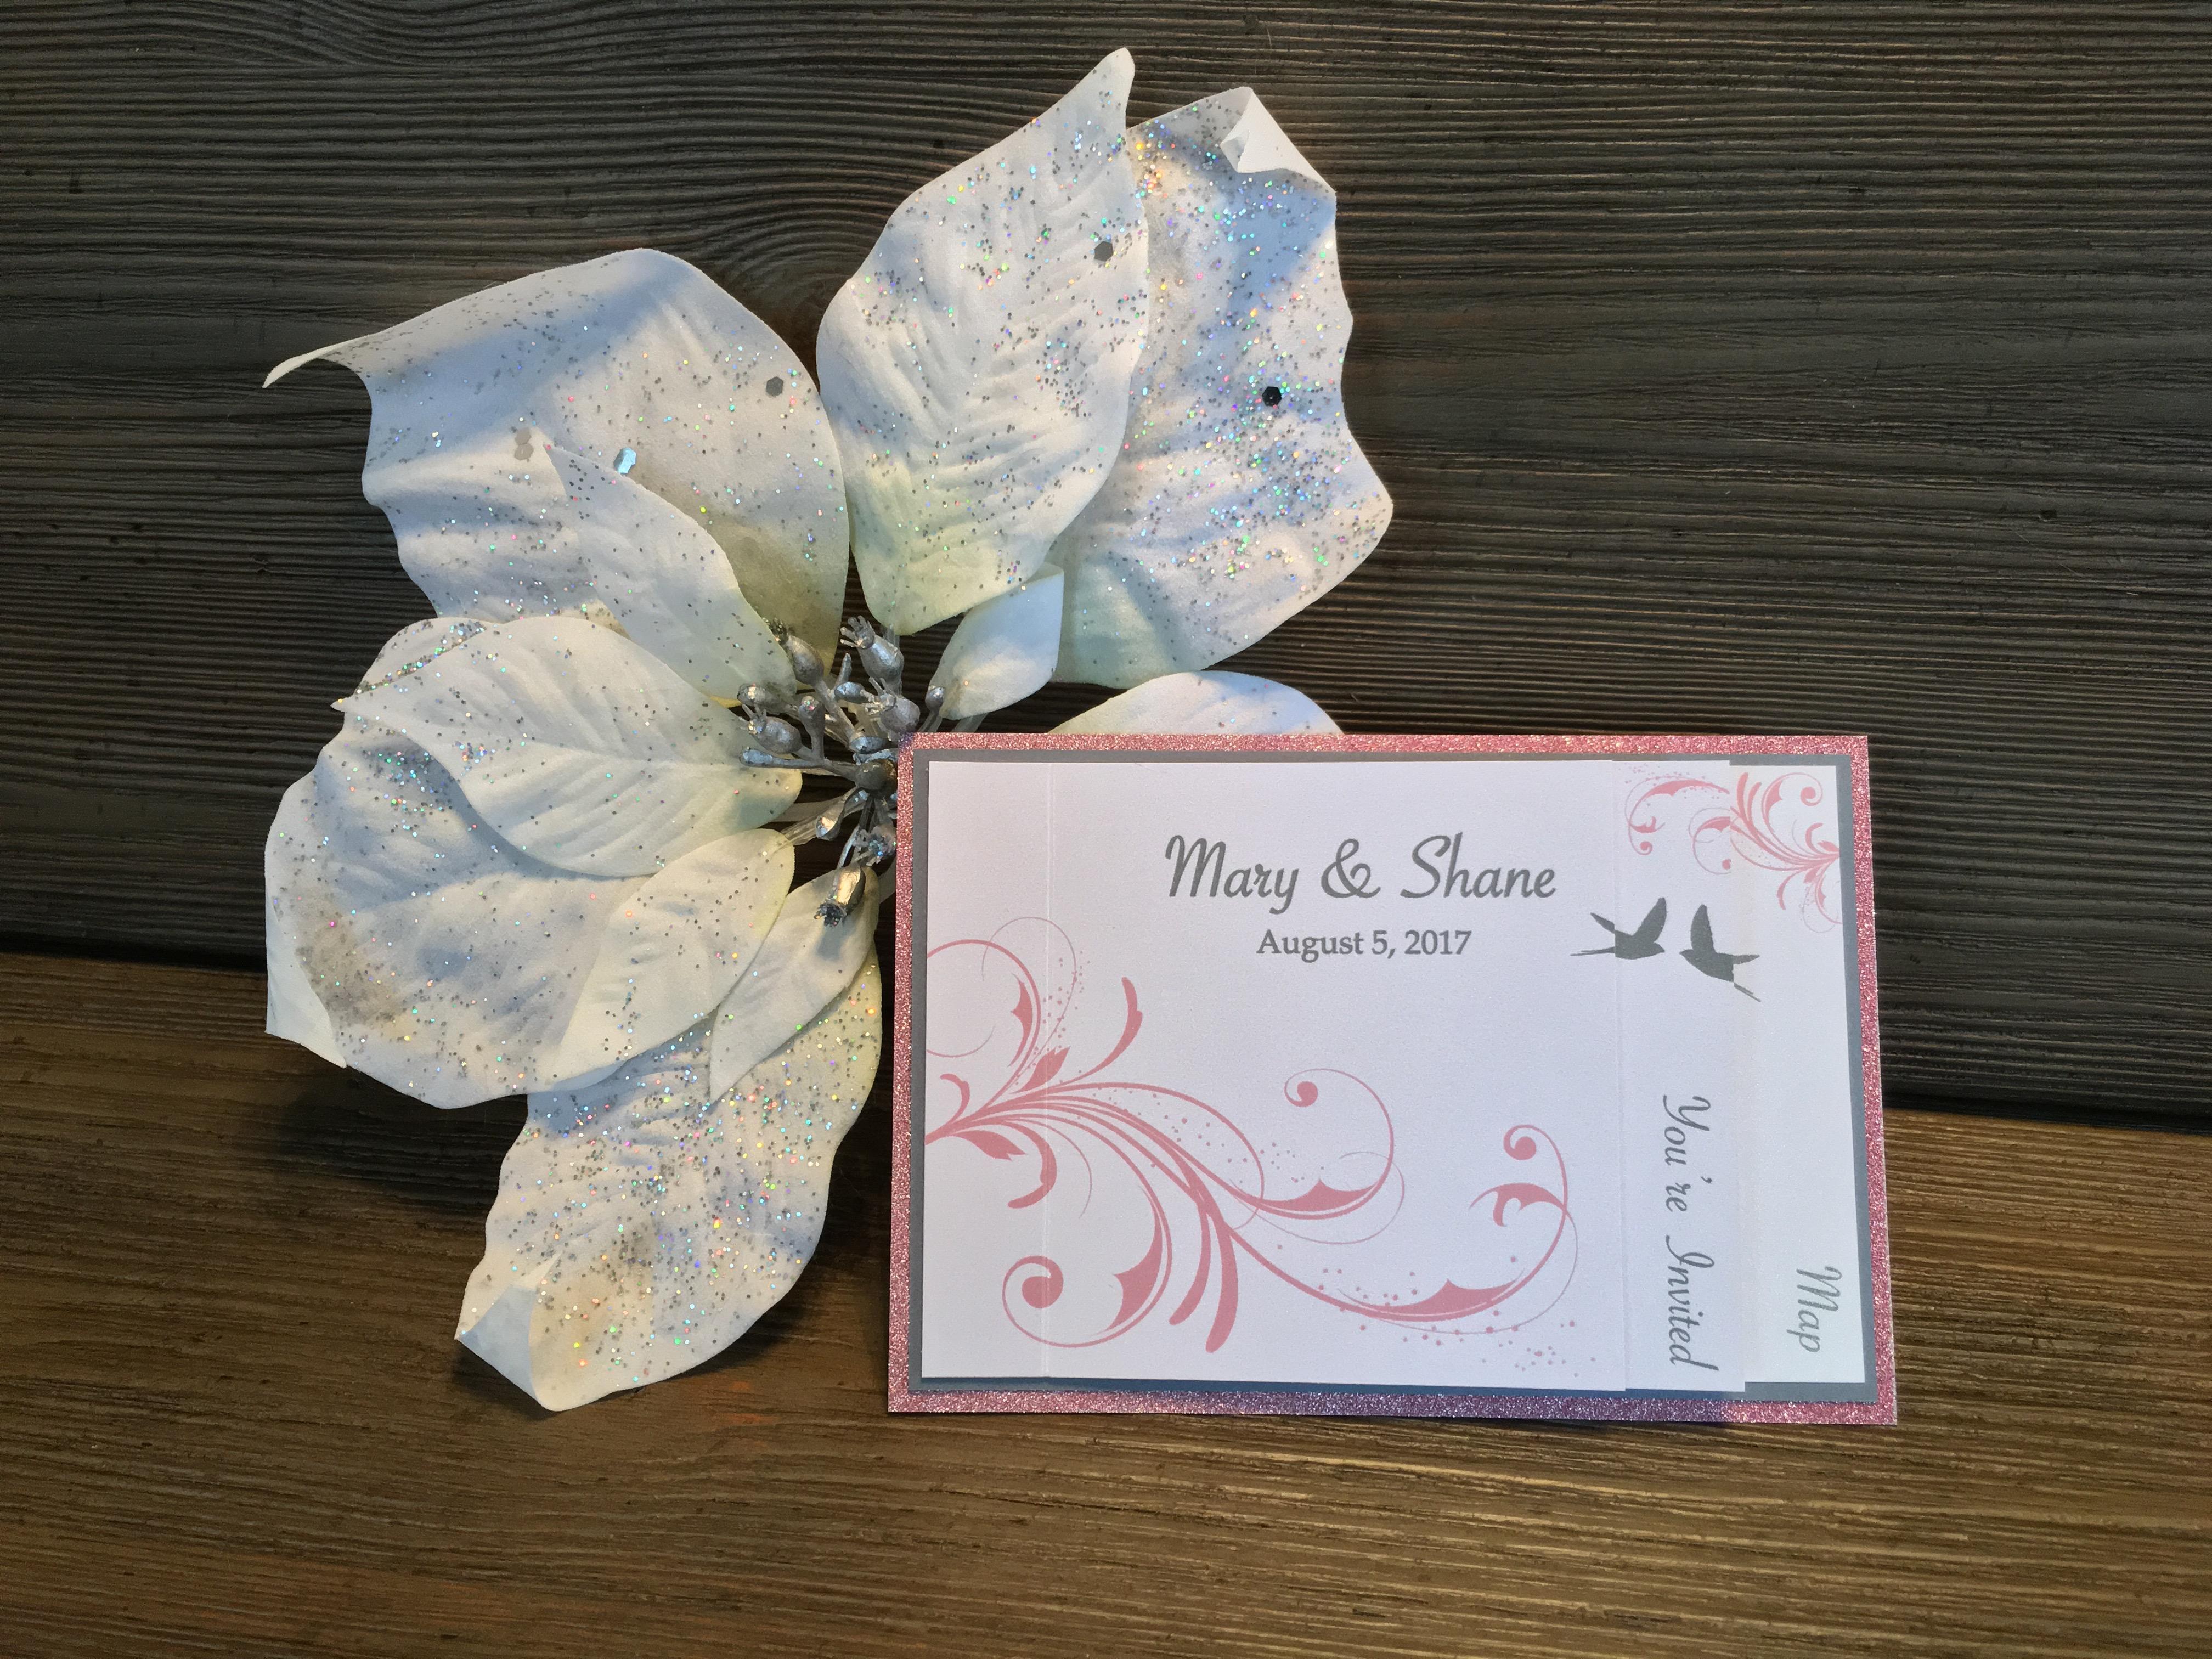 Weddings Invitations Stationary Weddings, Invitations, Stationary